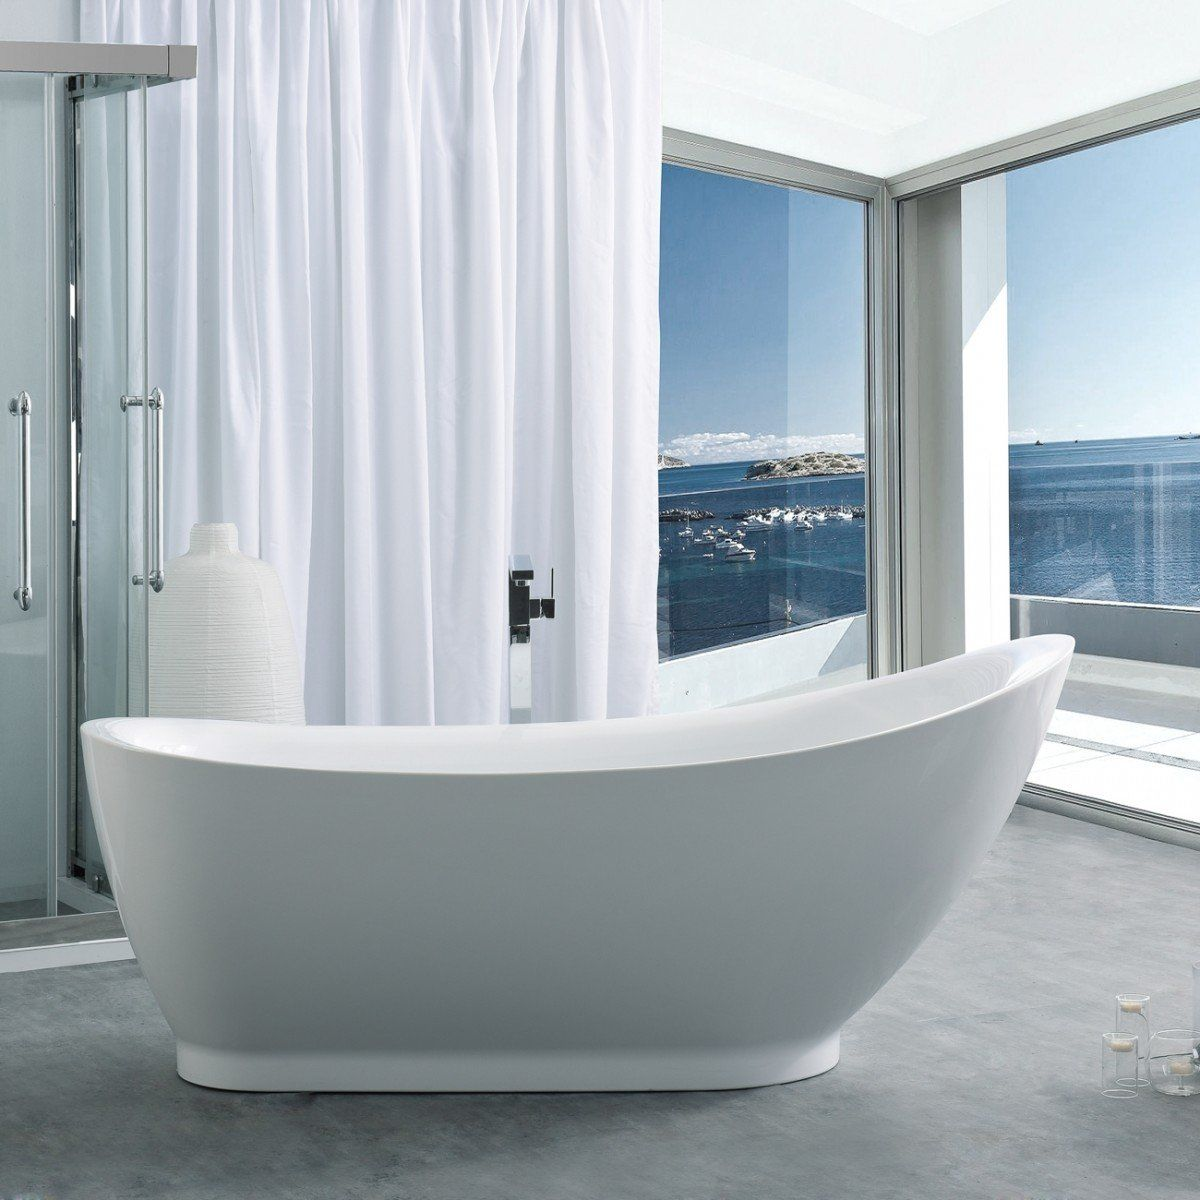 Jamison 71 Inch Acrylic Slipper Freestanding Tub No Faucet